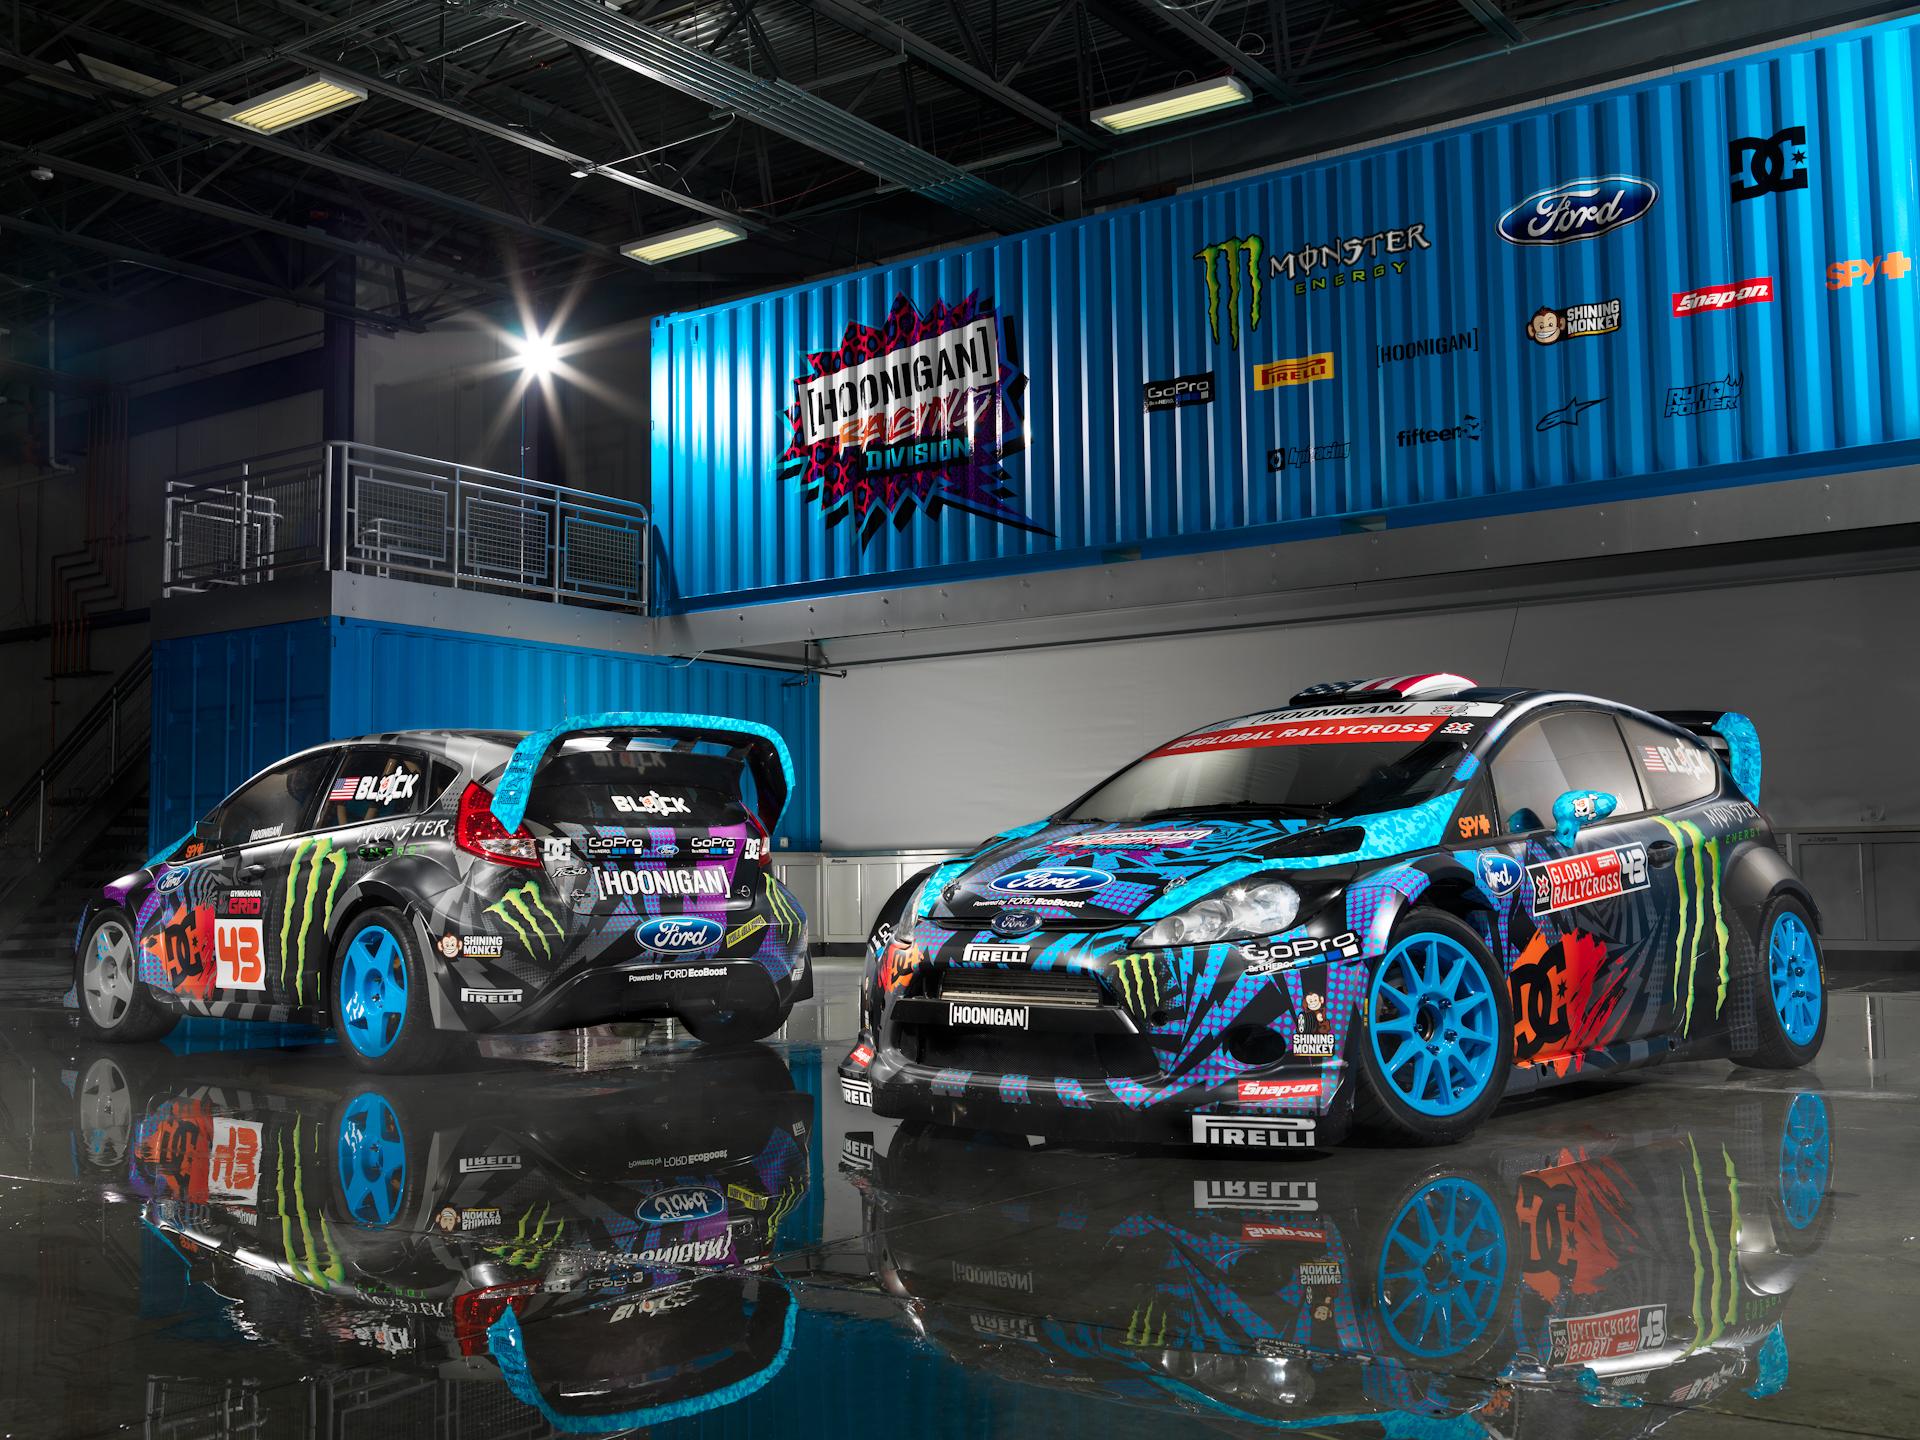 Ken Block Ford Fiesta Hoonigan Racing Dvision 187 Eftm